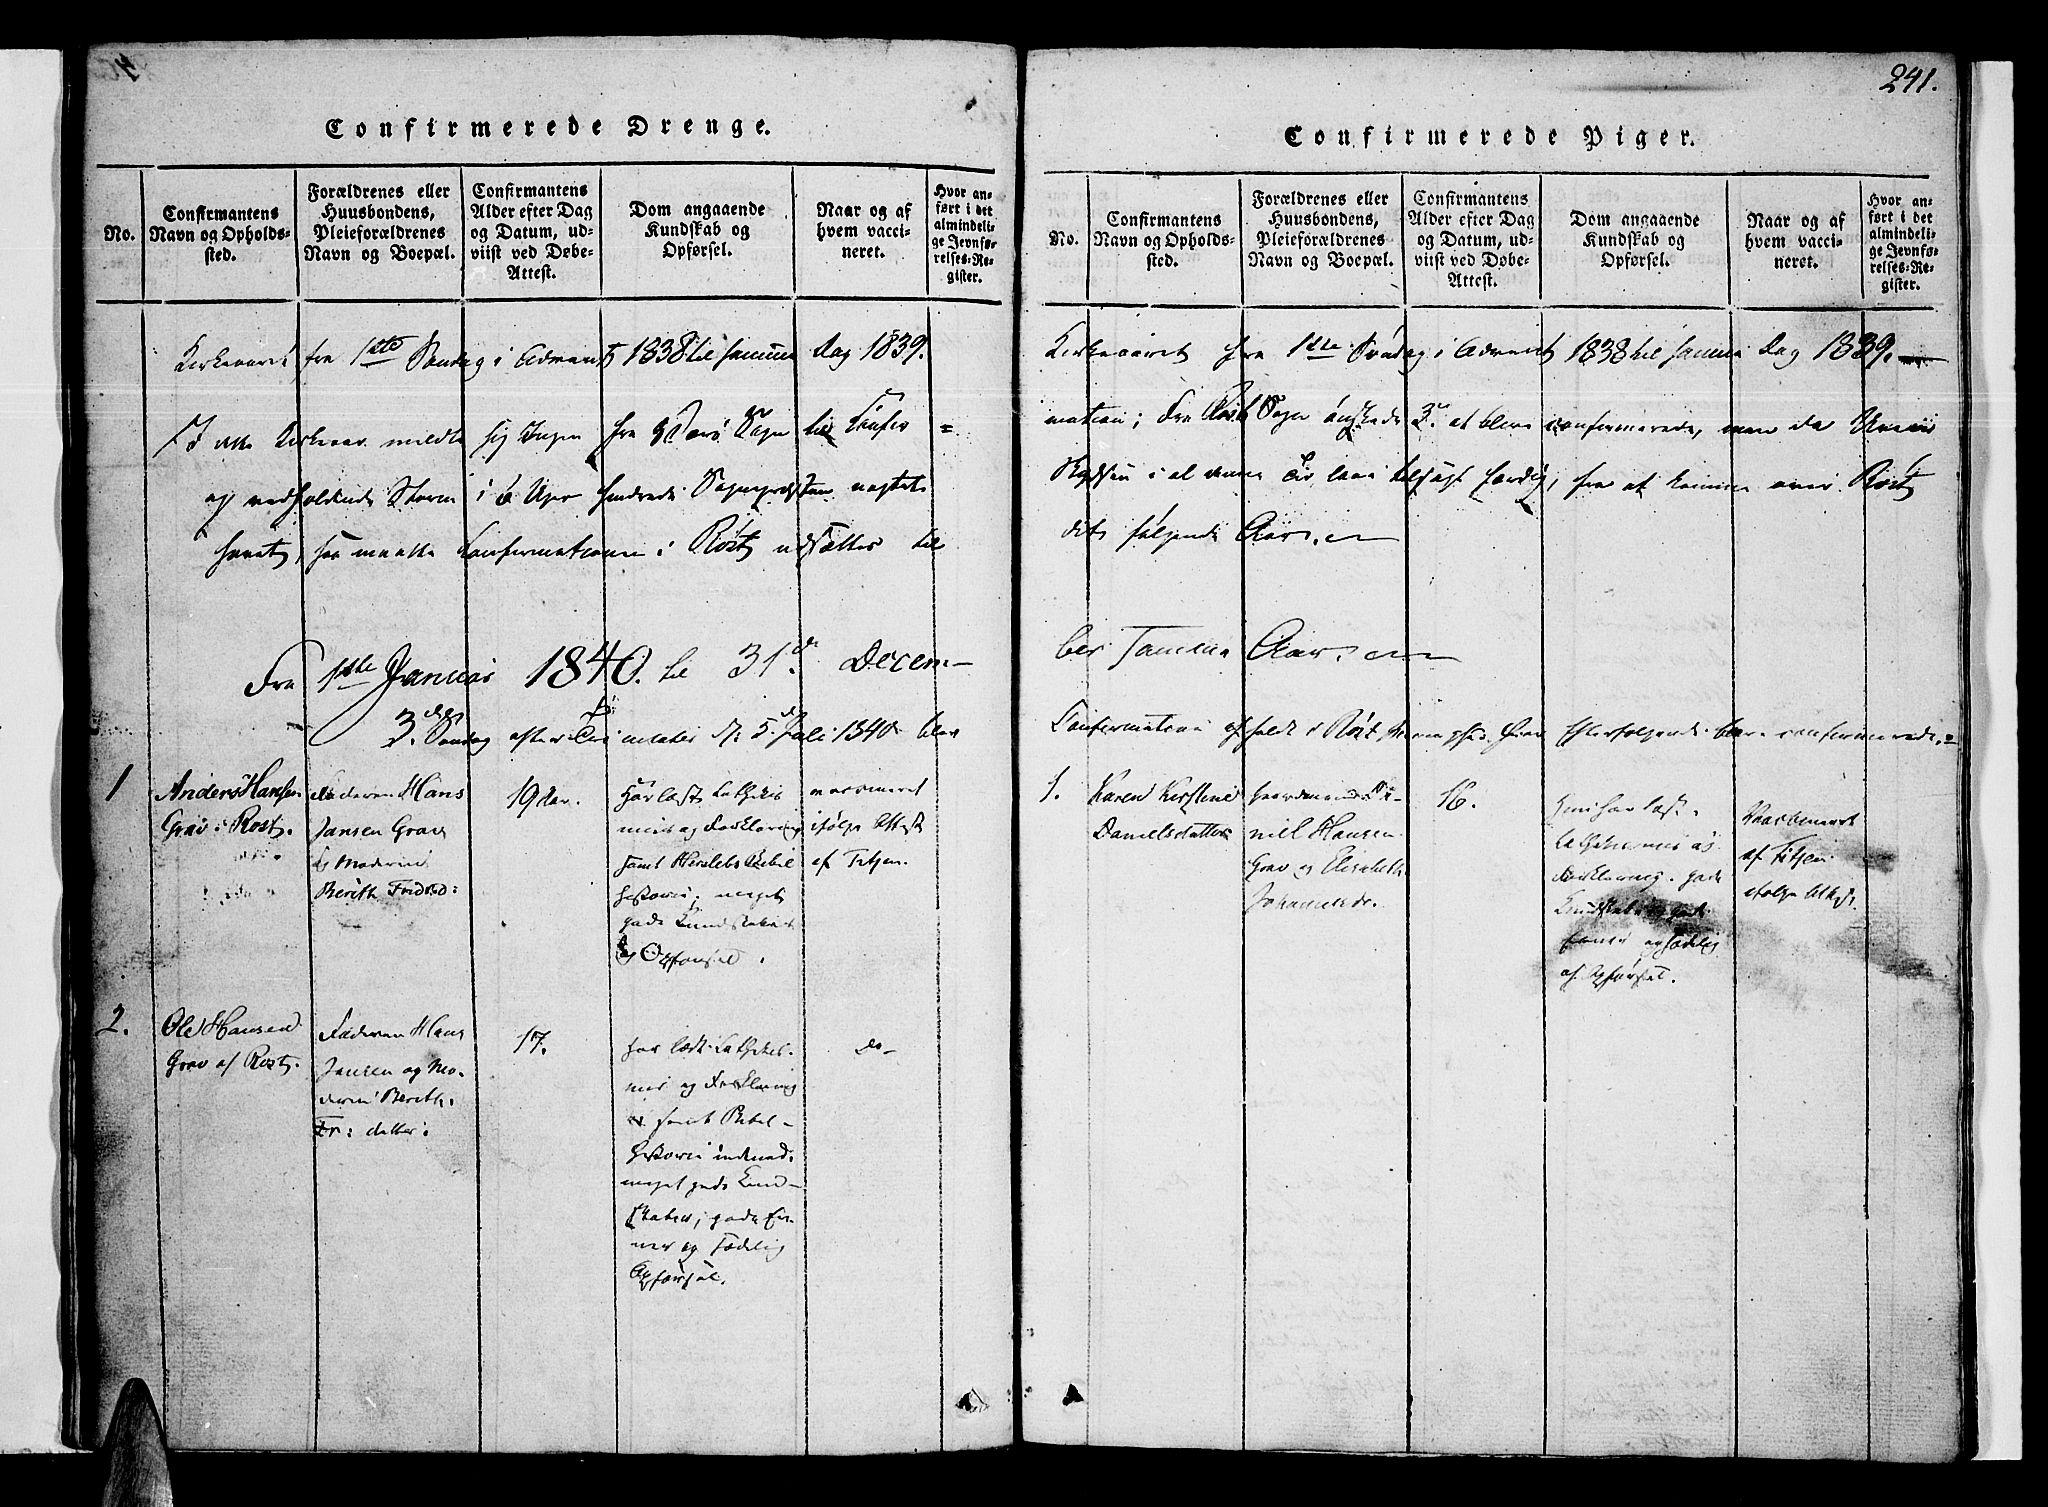 SAT, Ministerialprotokoller, klokkerbøker og fødselsregistre - Nordland, 807/L0120: Ministerialbok nr. 807A03, 1821-1848, s. 241